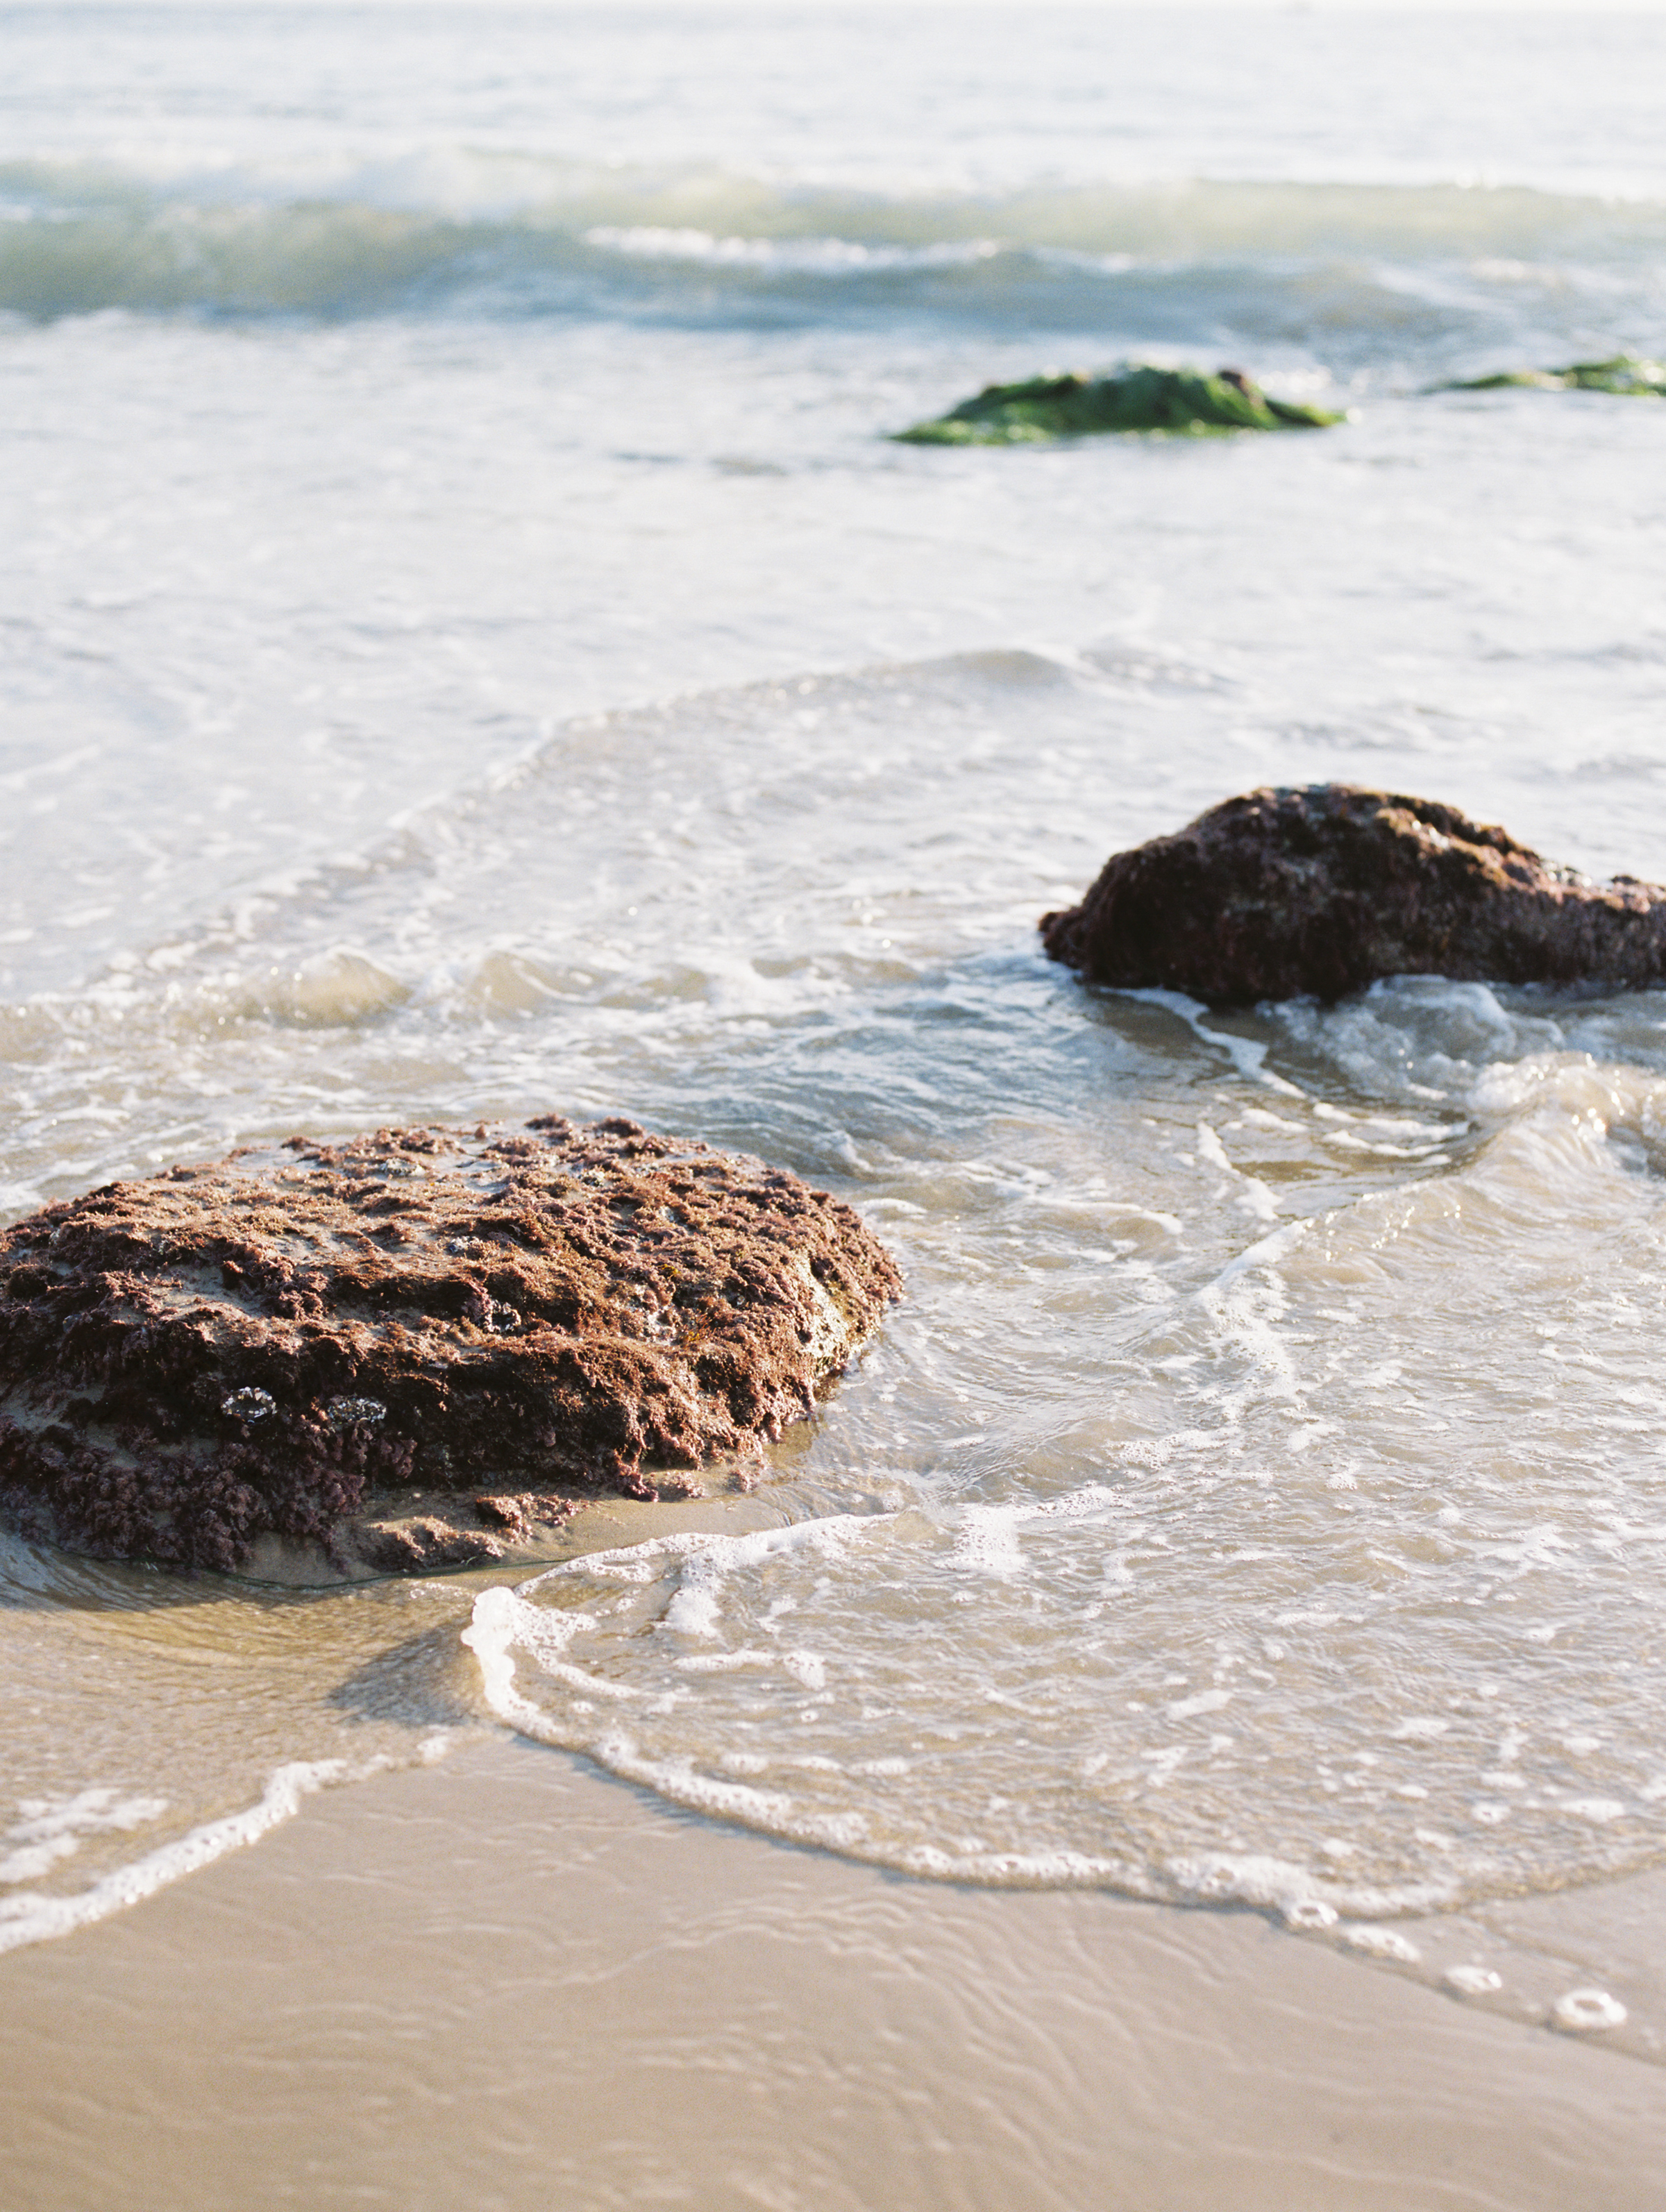 laguna-beach-orange-county-los-angeles-california-engagement-photos-pictures-037.jpg